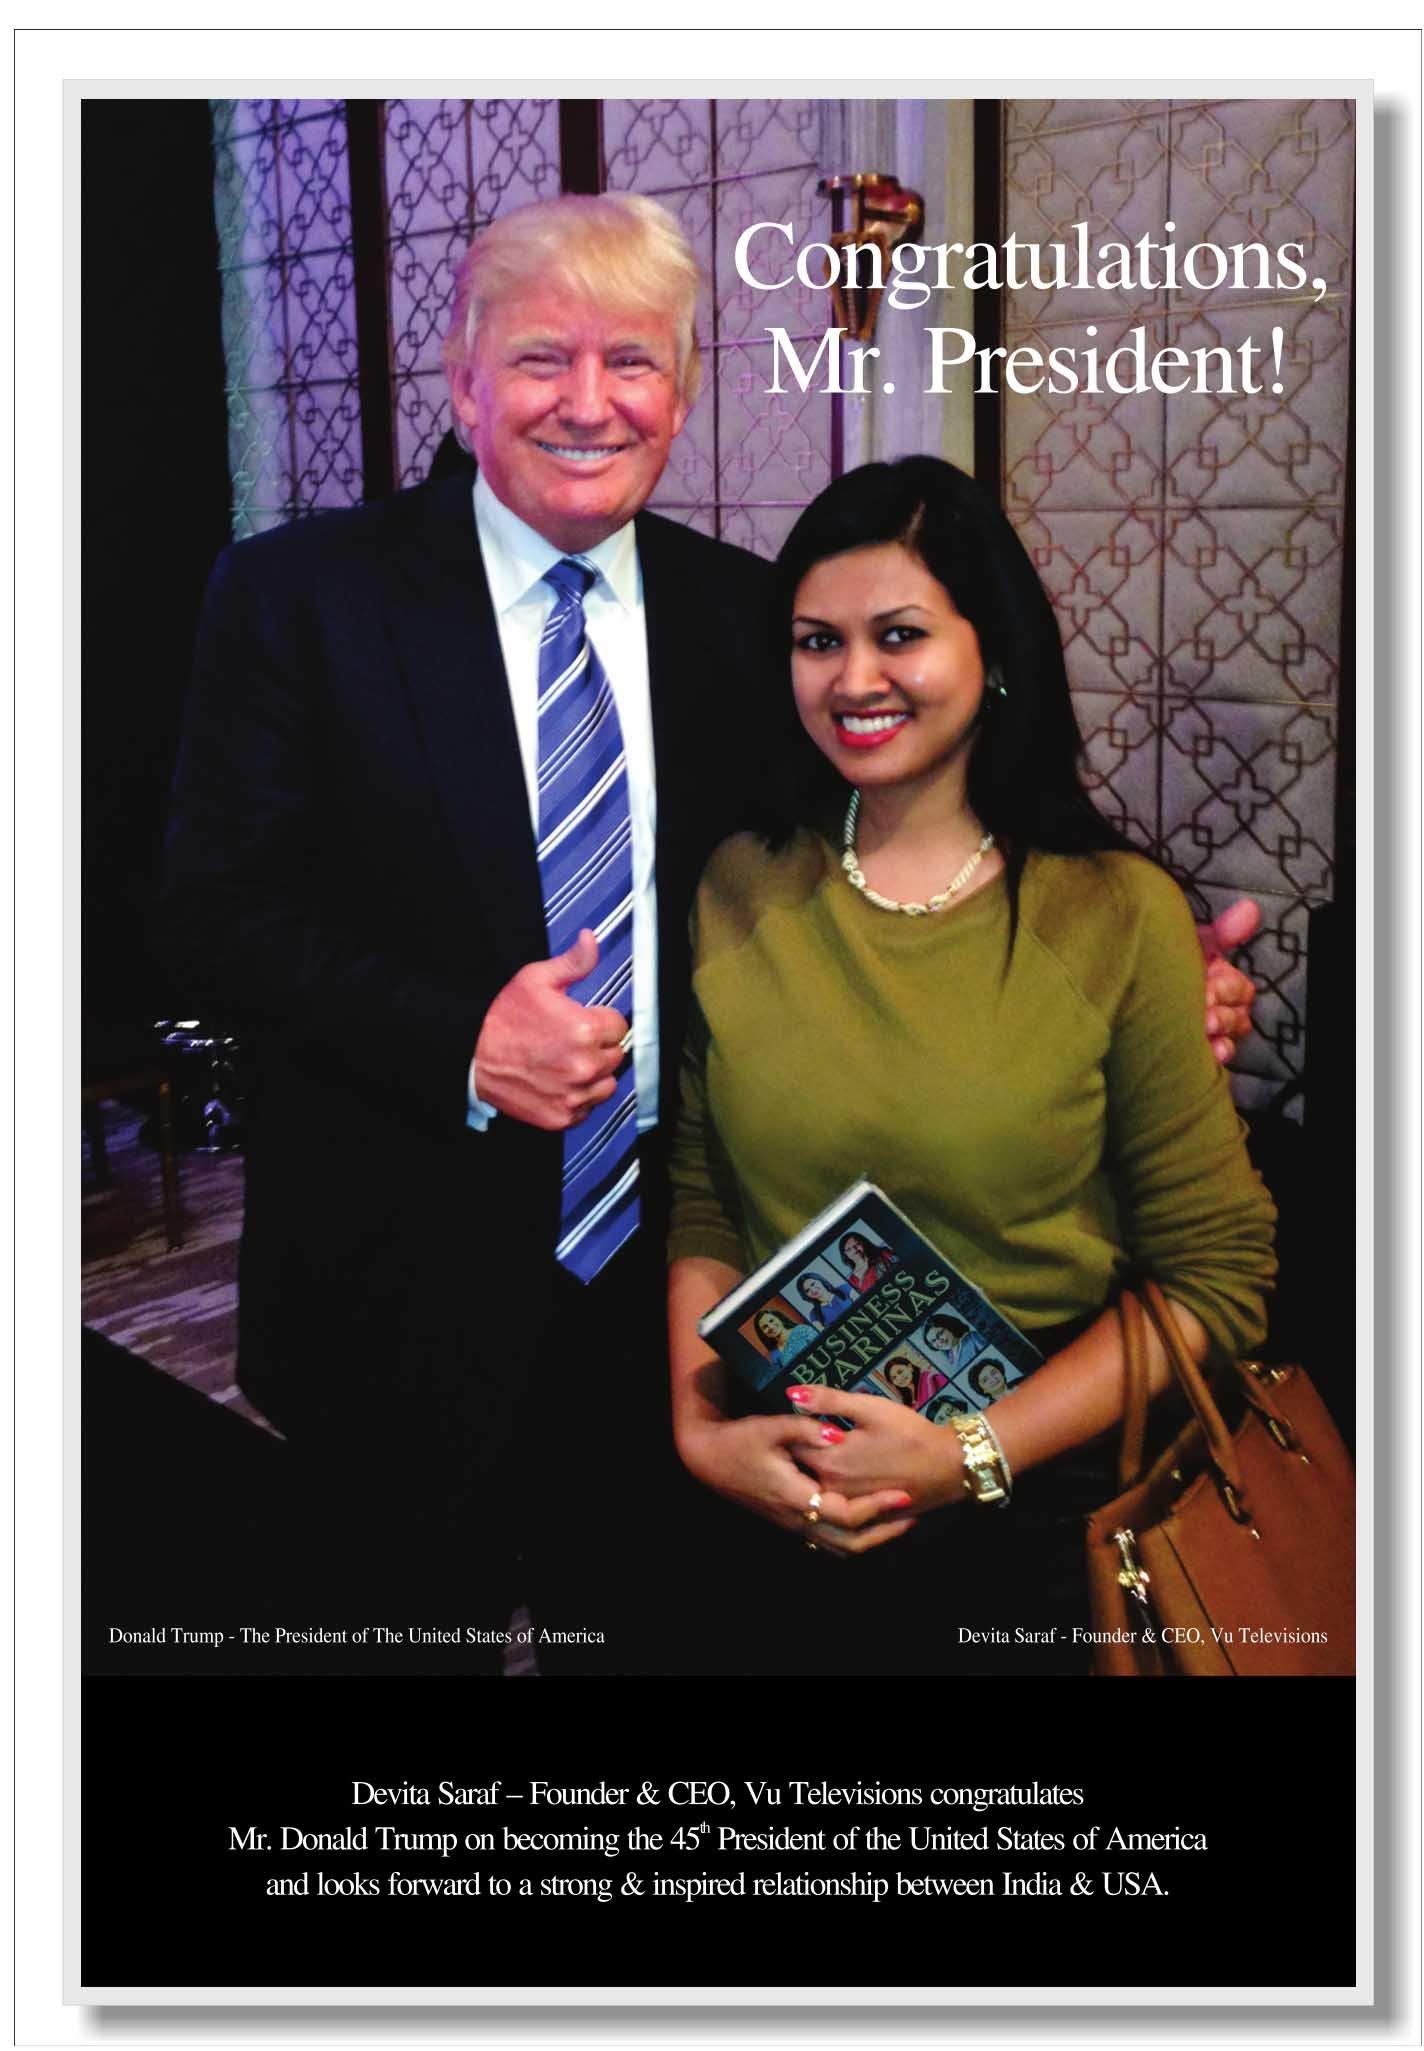 Vu-Televisions-CEO-Devita-Saraf-congratulates-Donald-Trump-on-his-Presidential-inauguration-1.jpg